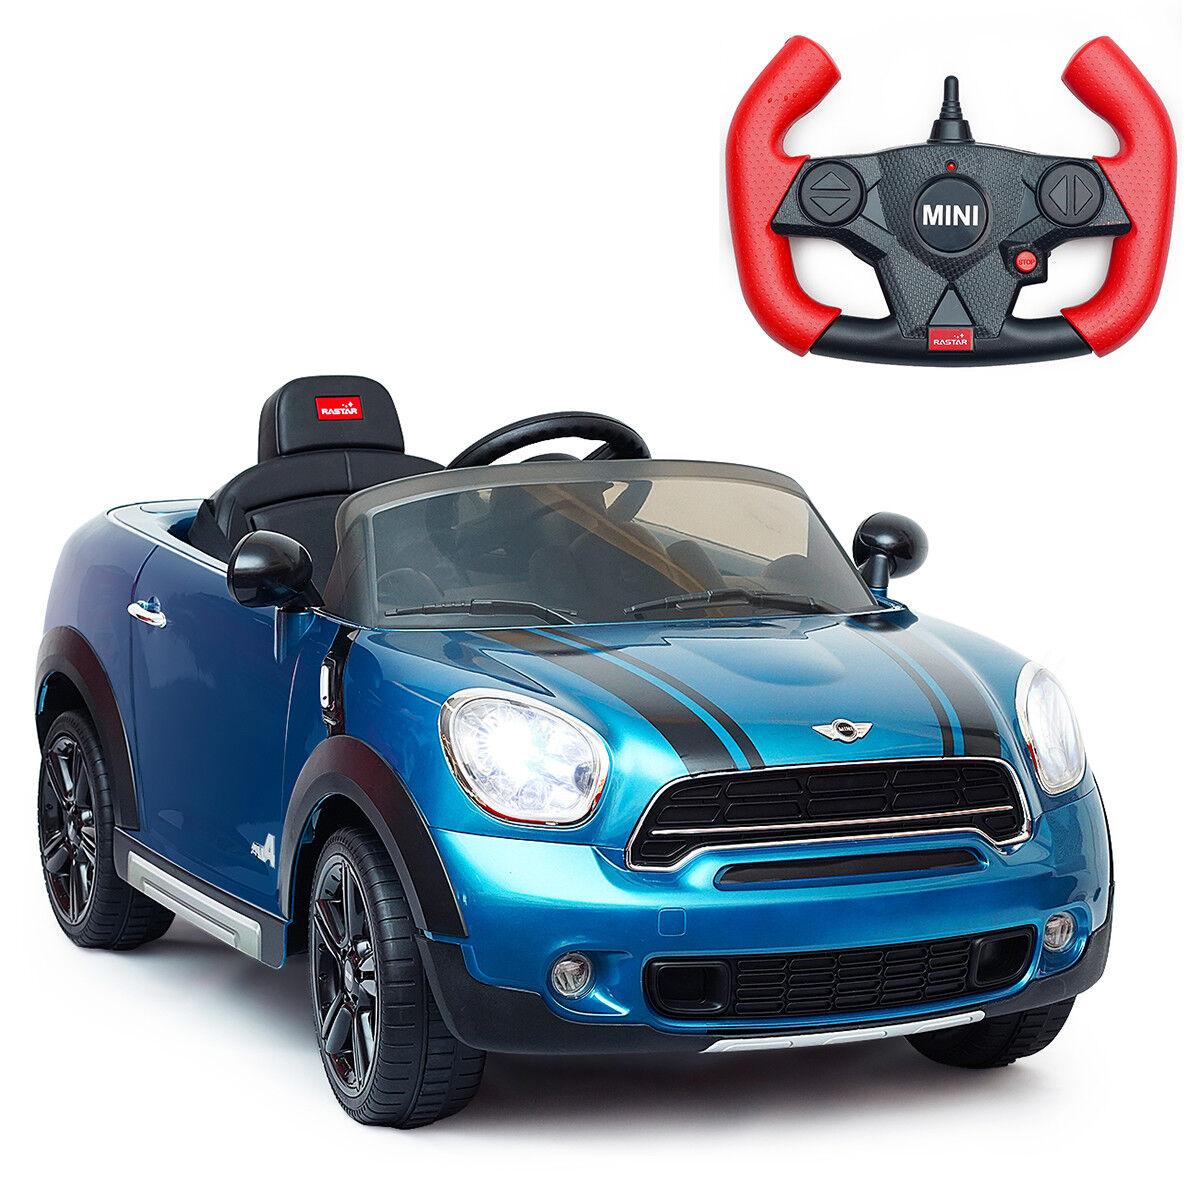 12v elektro - mini countryman zugelassene kinder auto remote controller blau